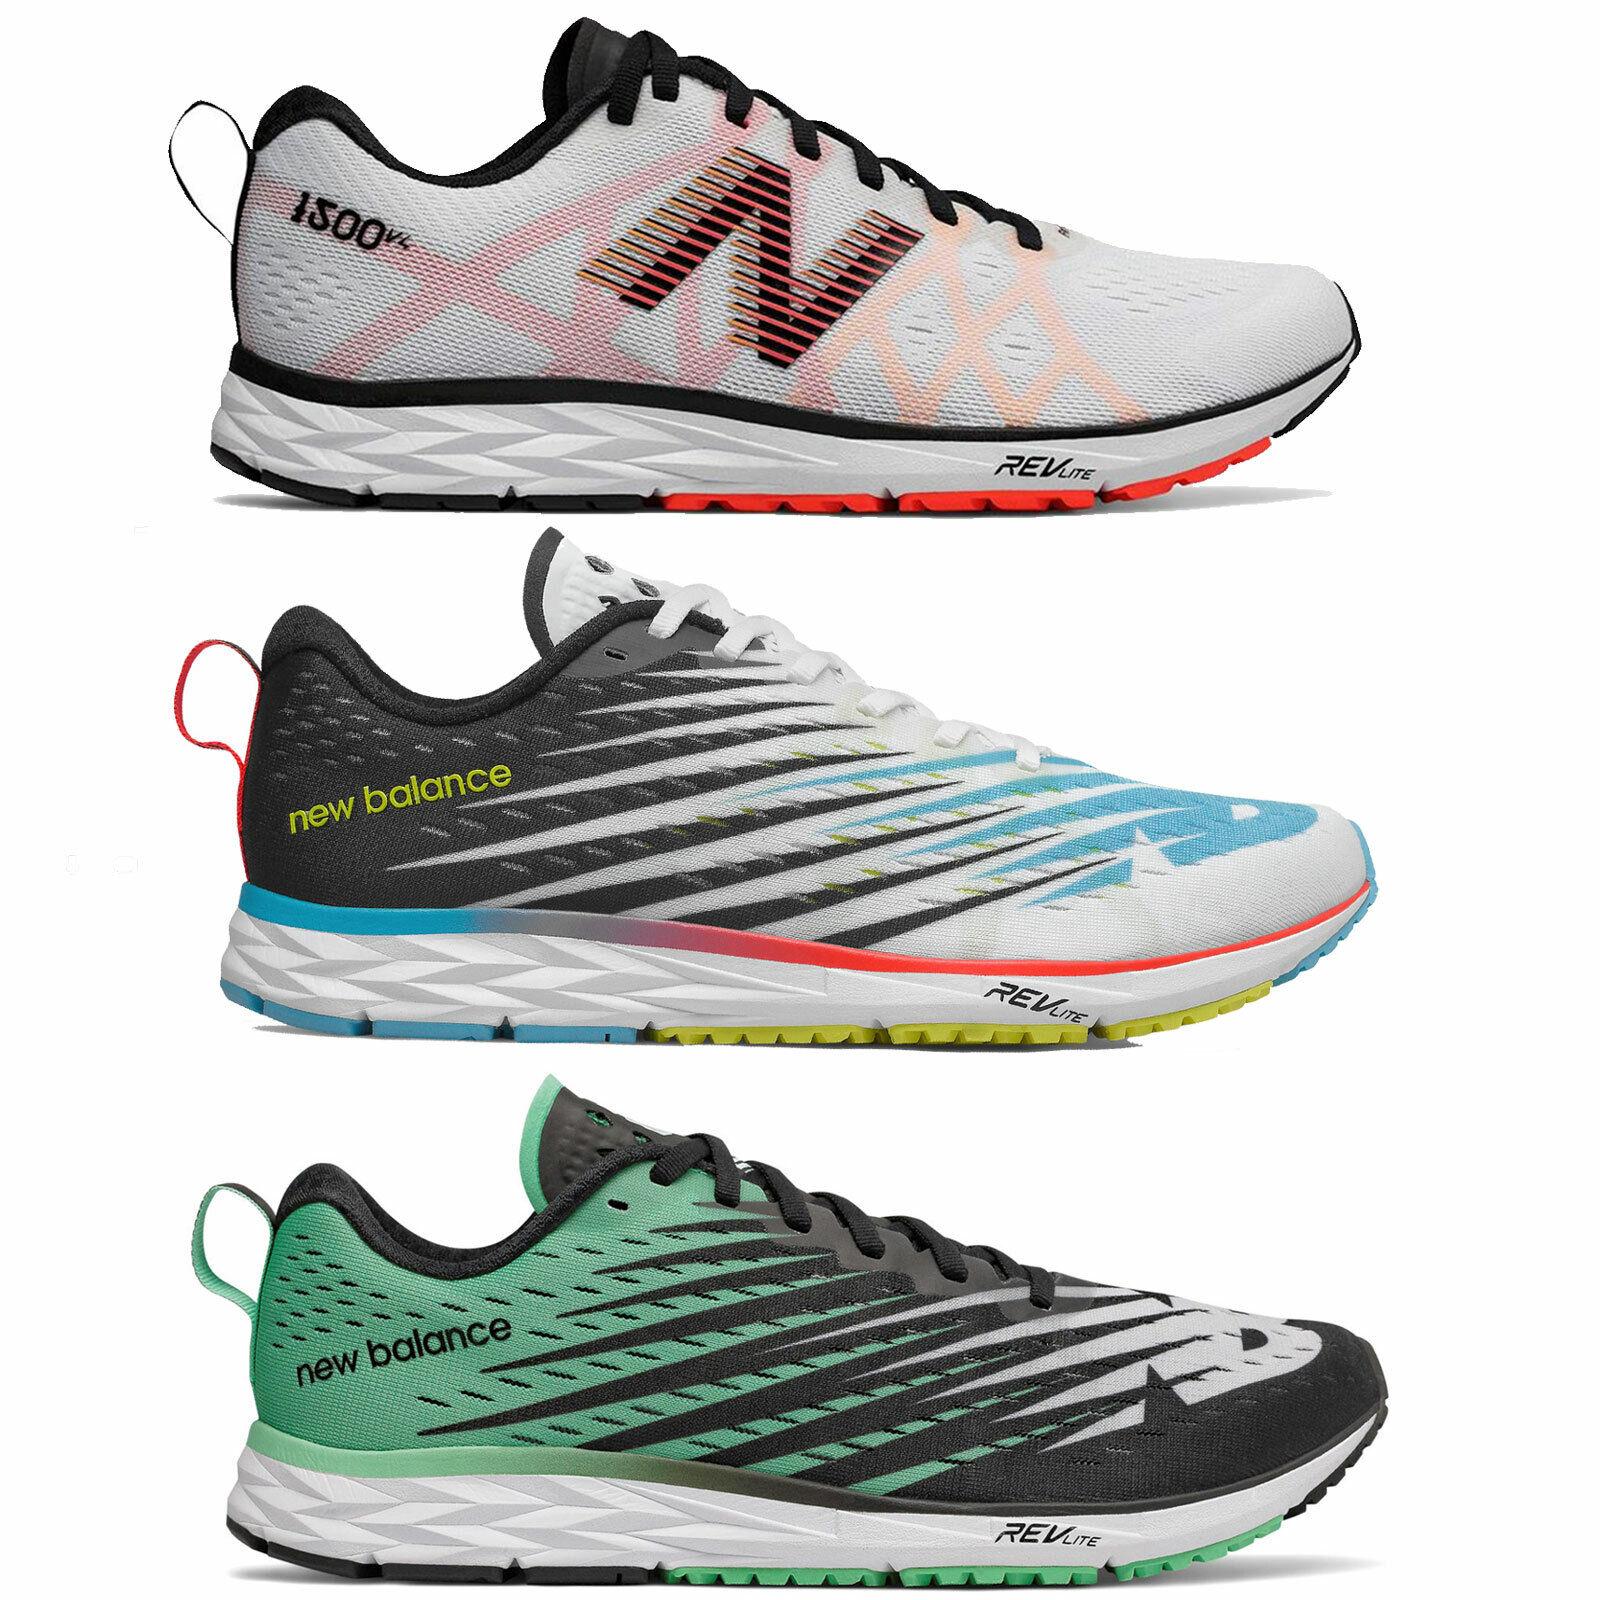 New Balance M1500 Men's Running scarpe Sports scarpe Training scarpe Running